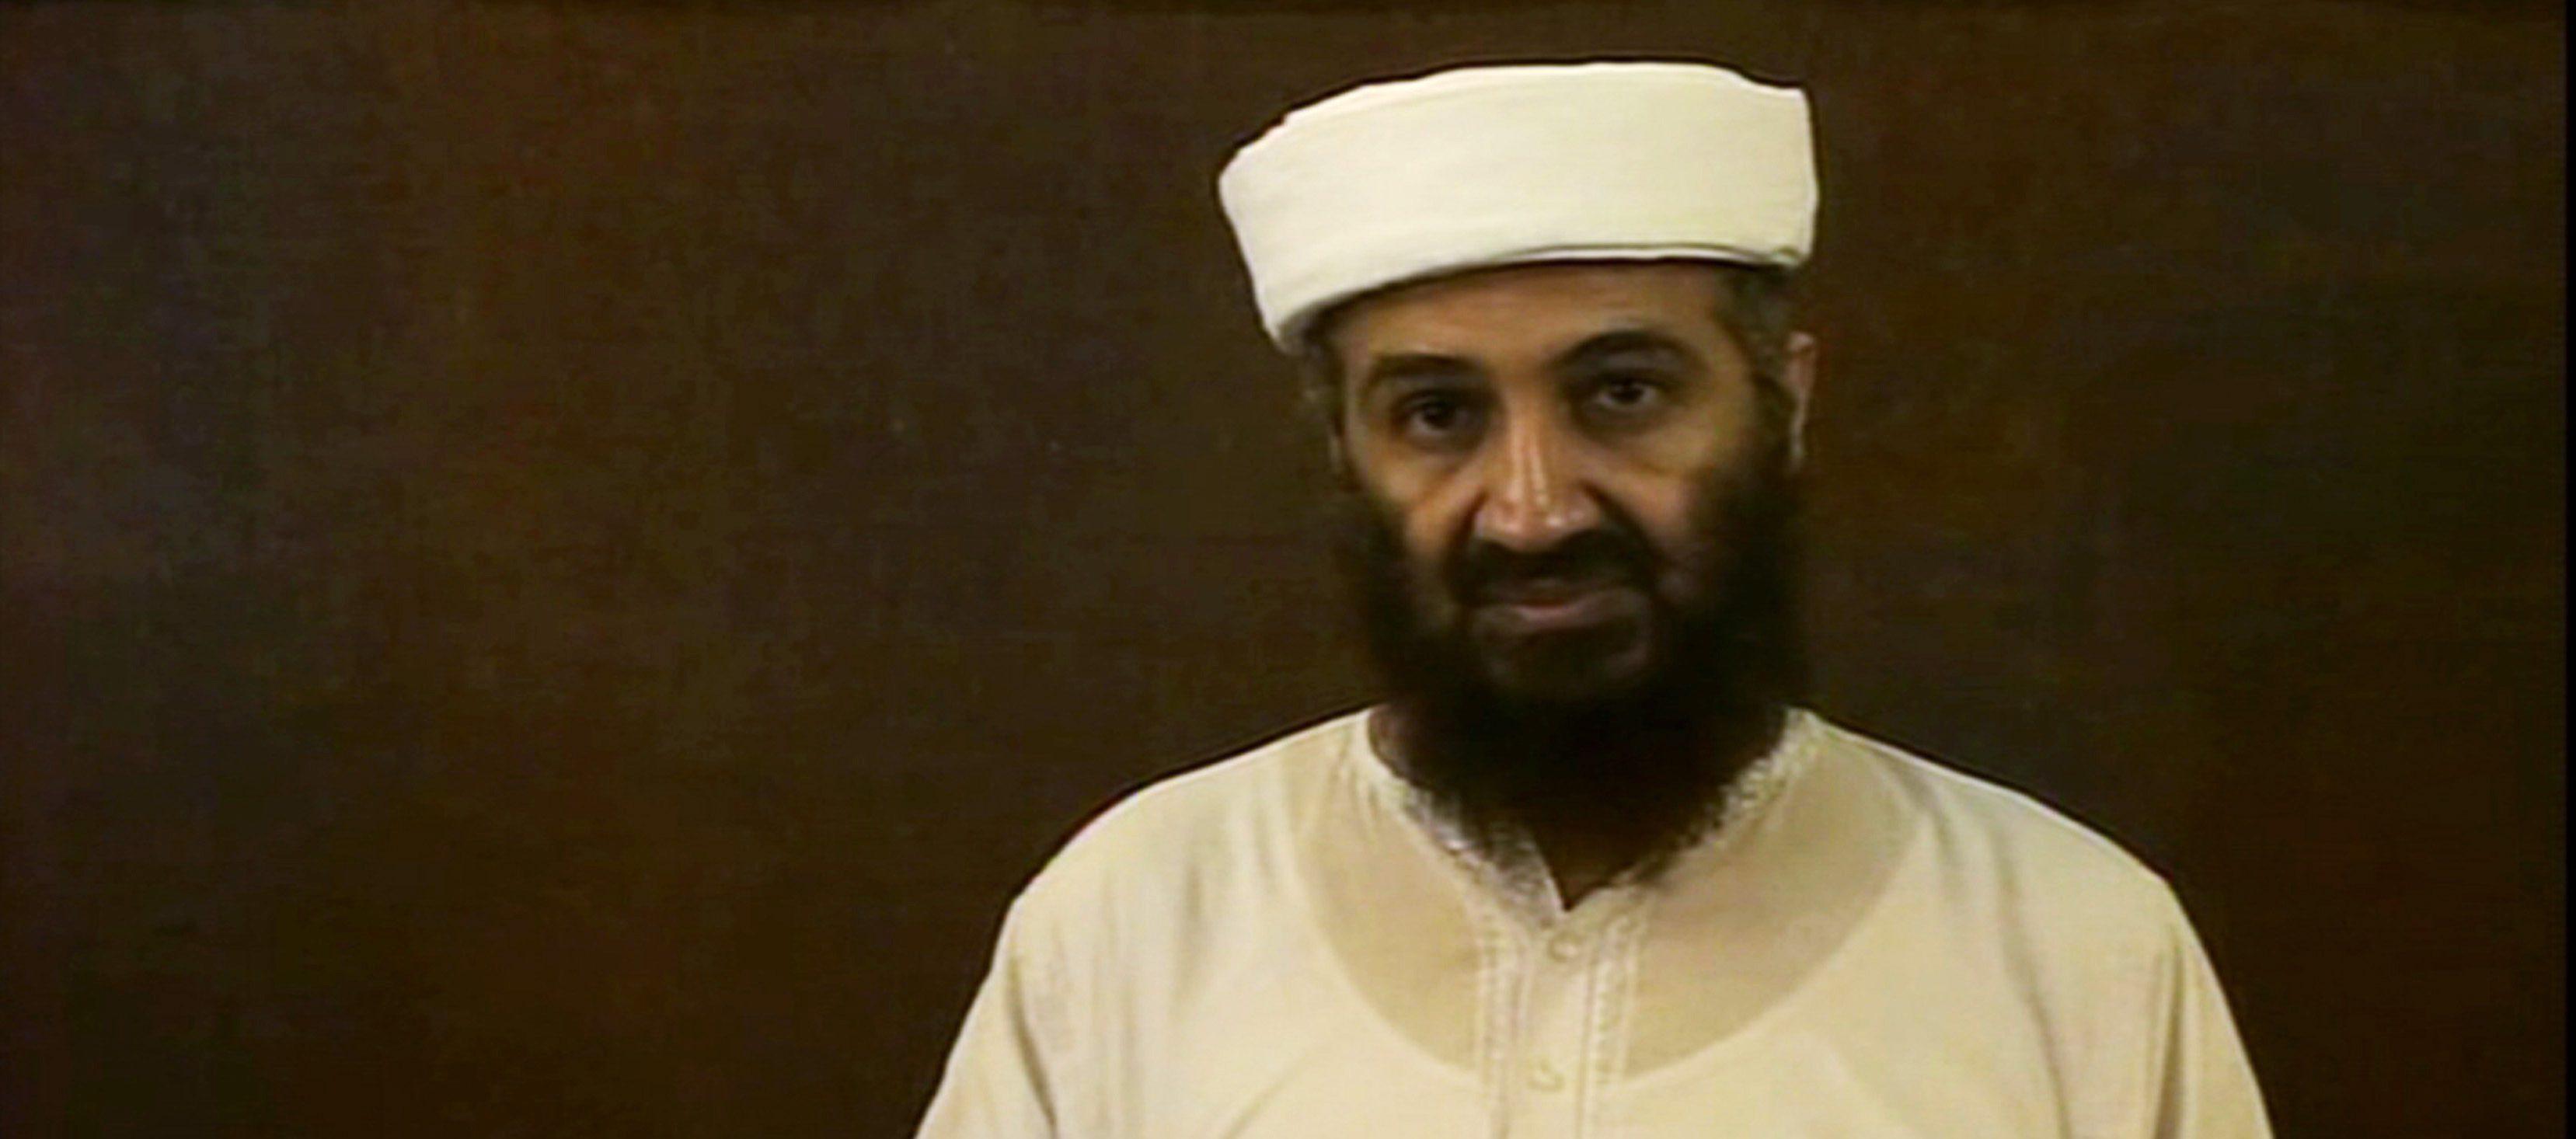 Islamisk webbsajt zarqawi sarad